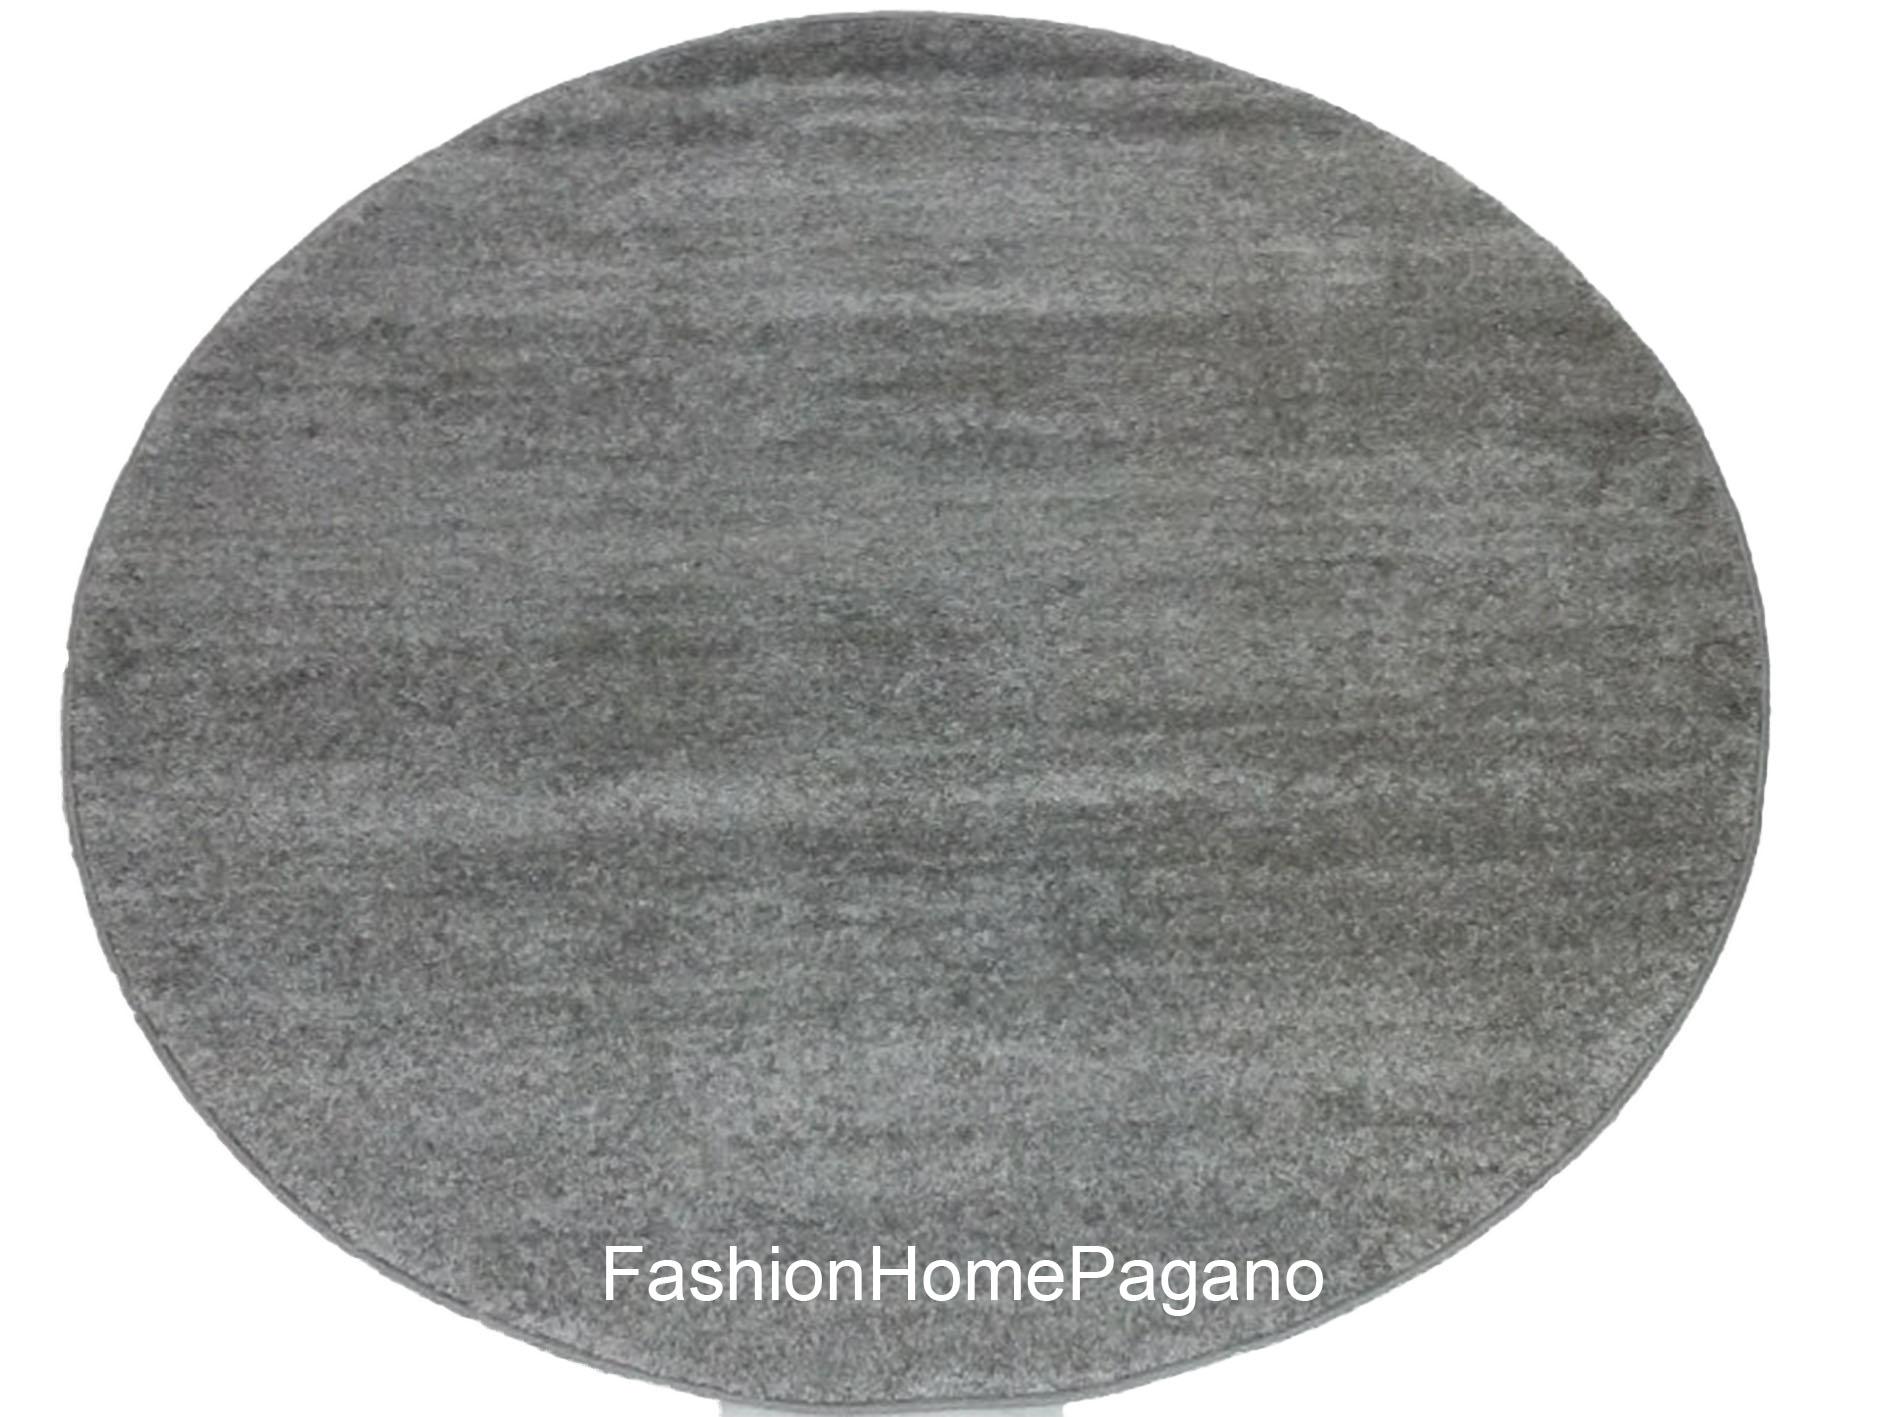 FHP-01368 - Rotondi - fashion home pagano - Tappeto tondo ...